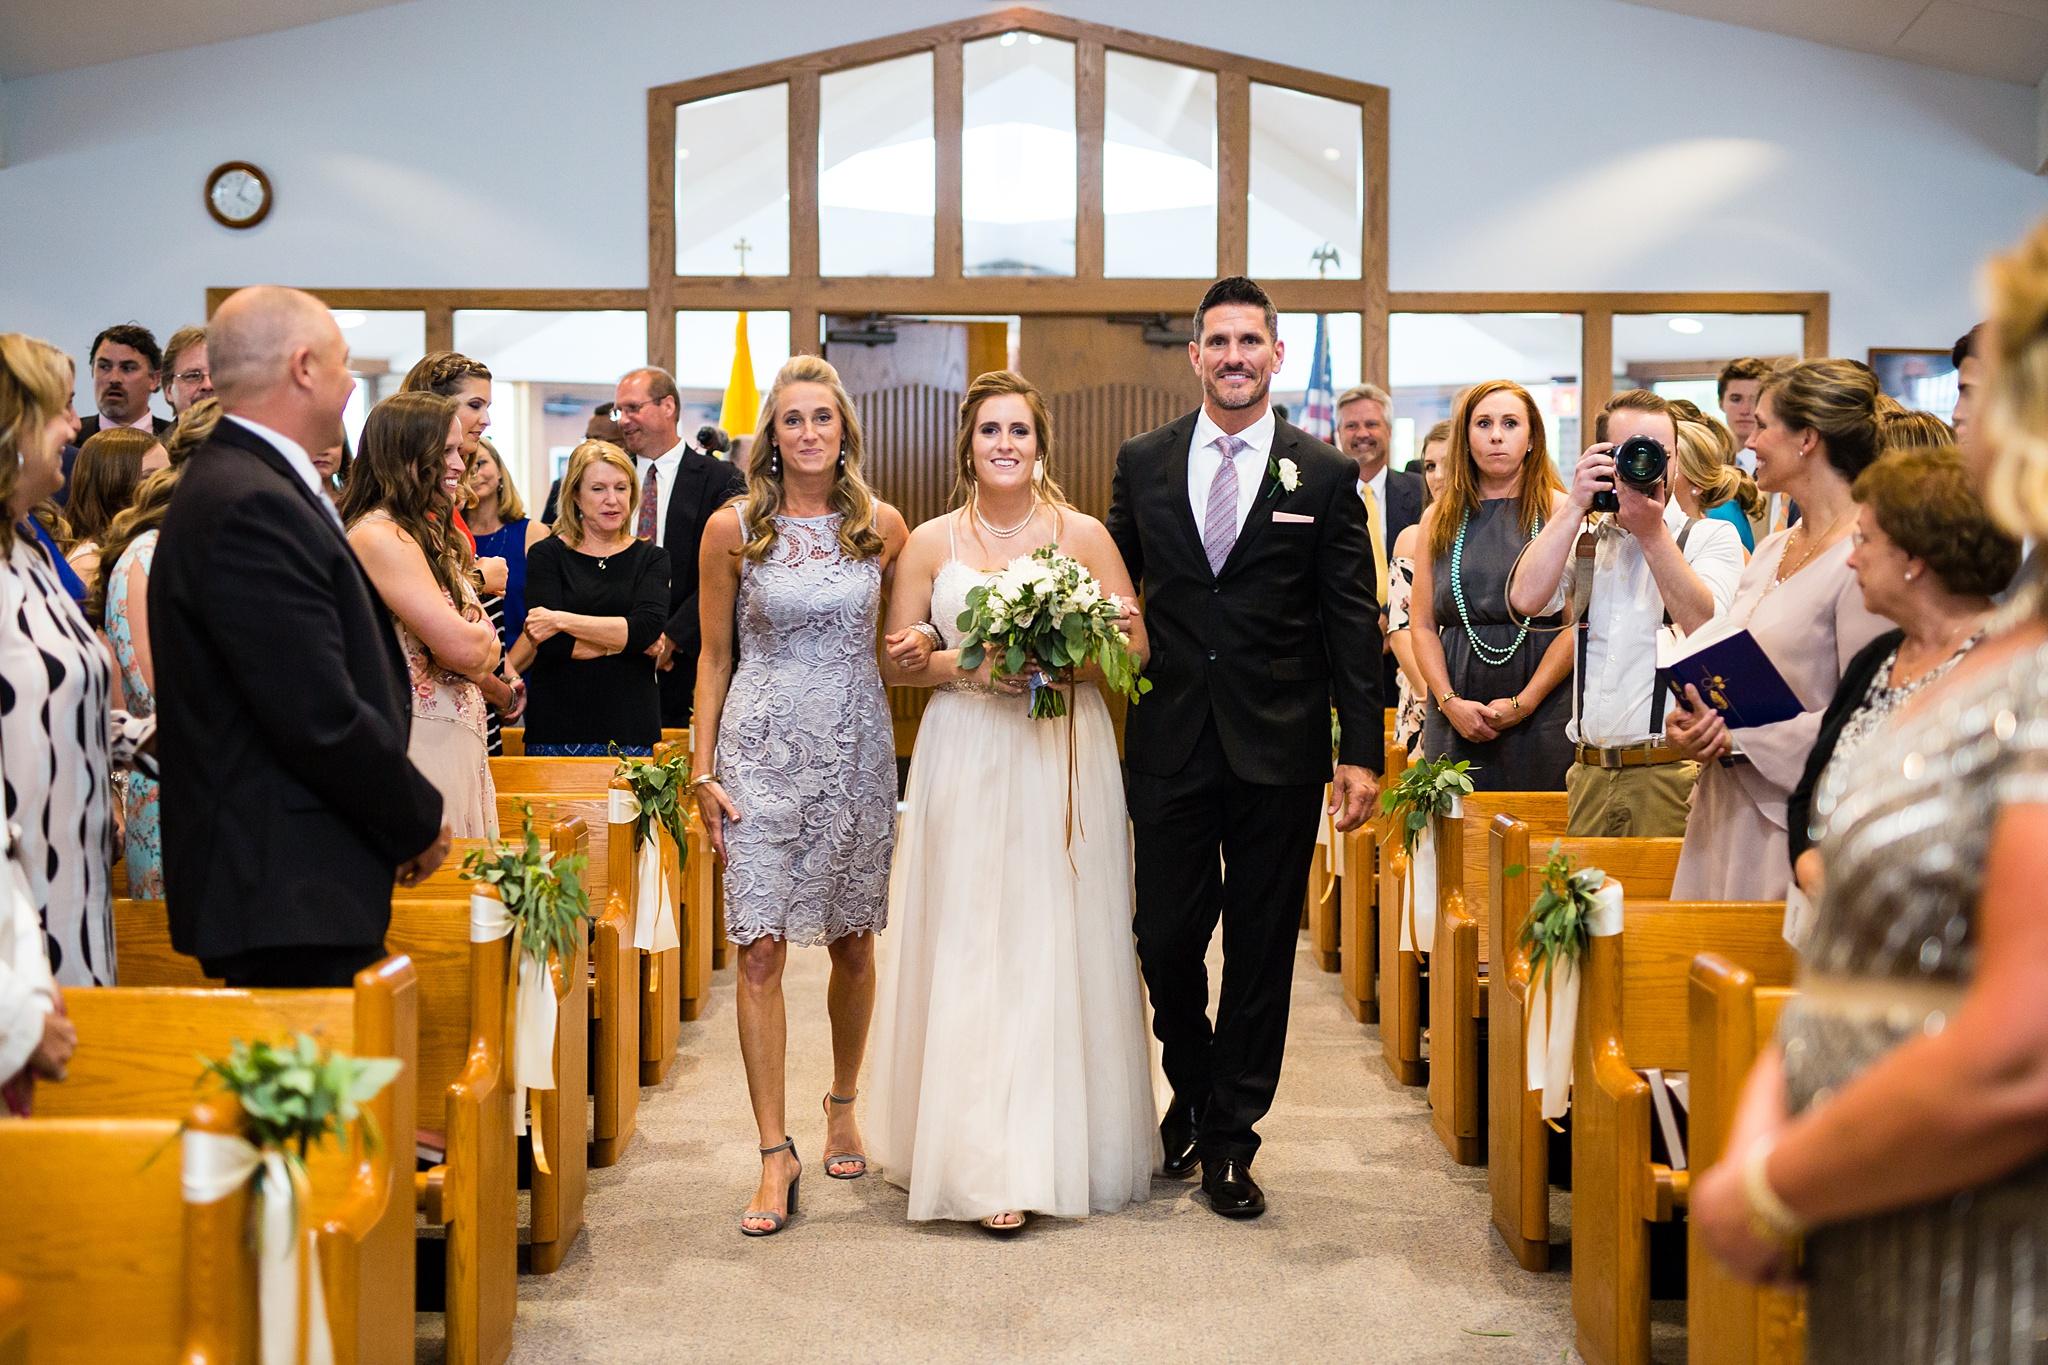 Meghan_Drew_Grand_Rapids_Cheney_place_Wedding049.JPG